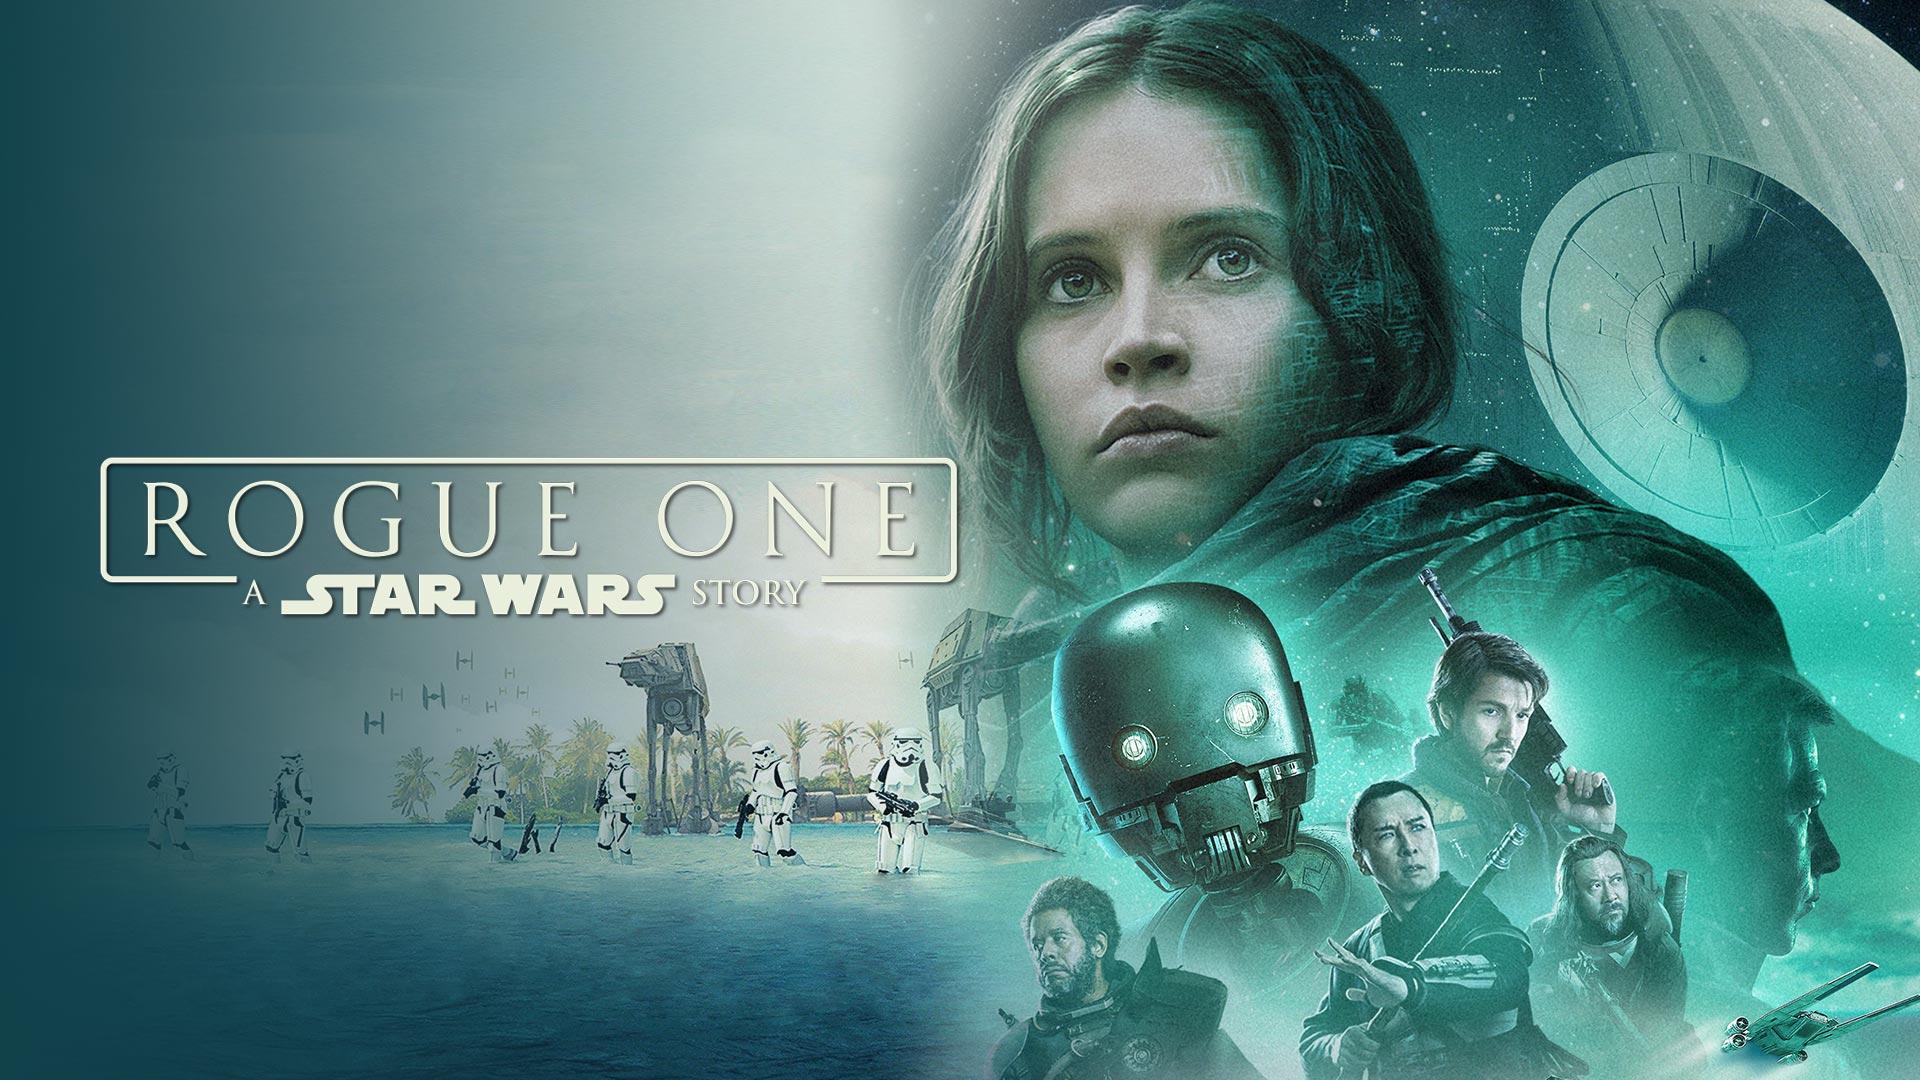 Watch Star Wars The Force Awakens 4k Uhd Prime Video